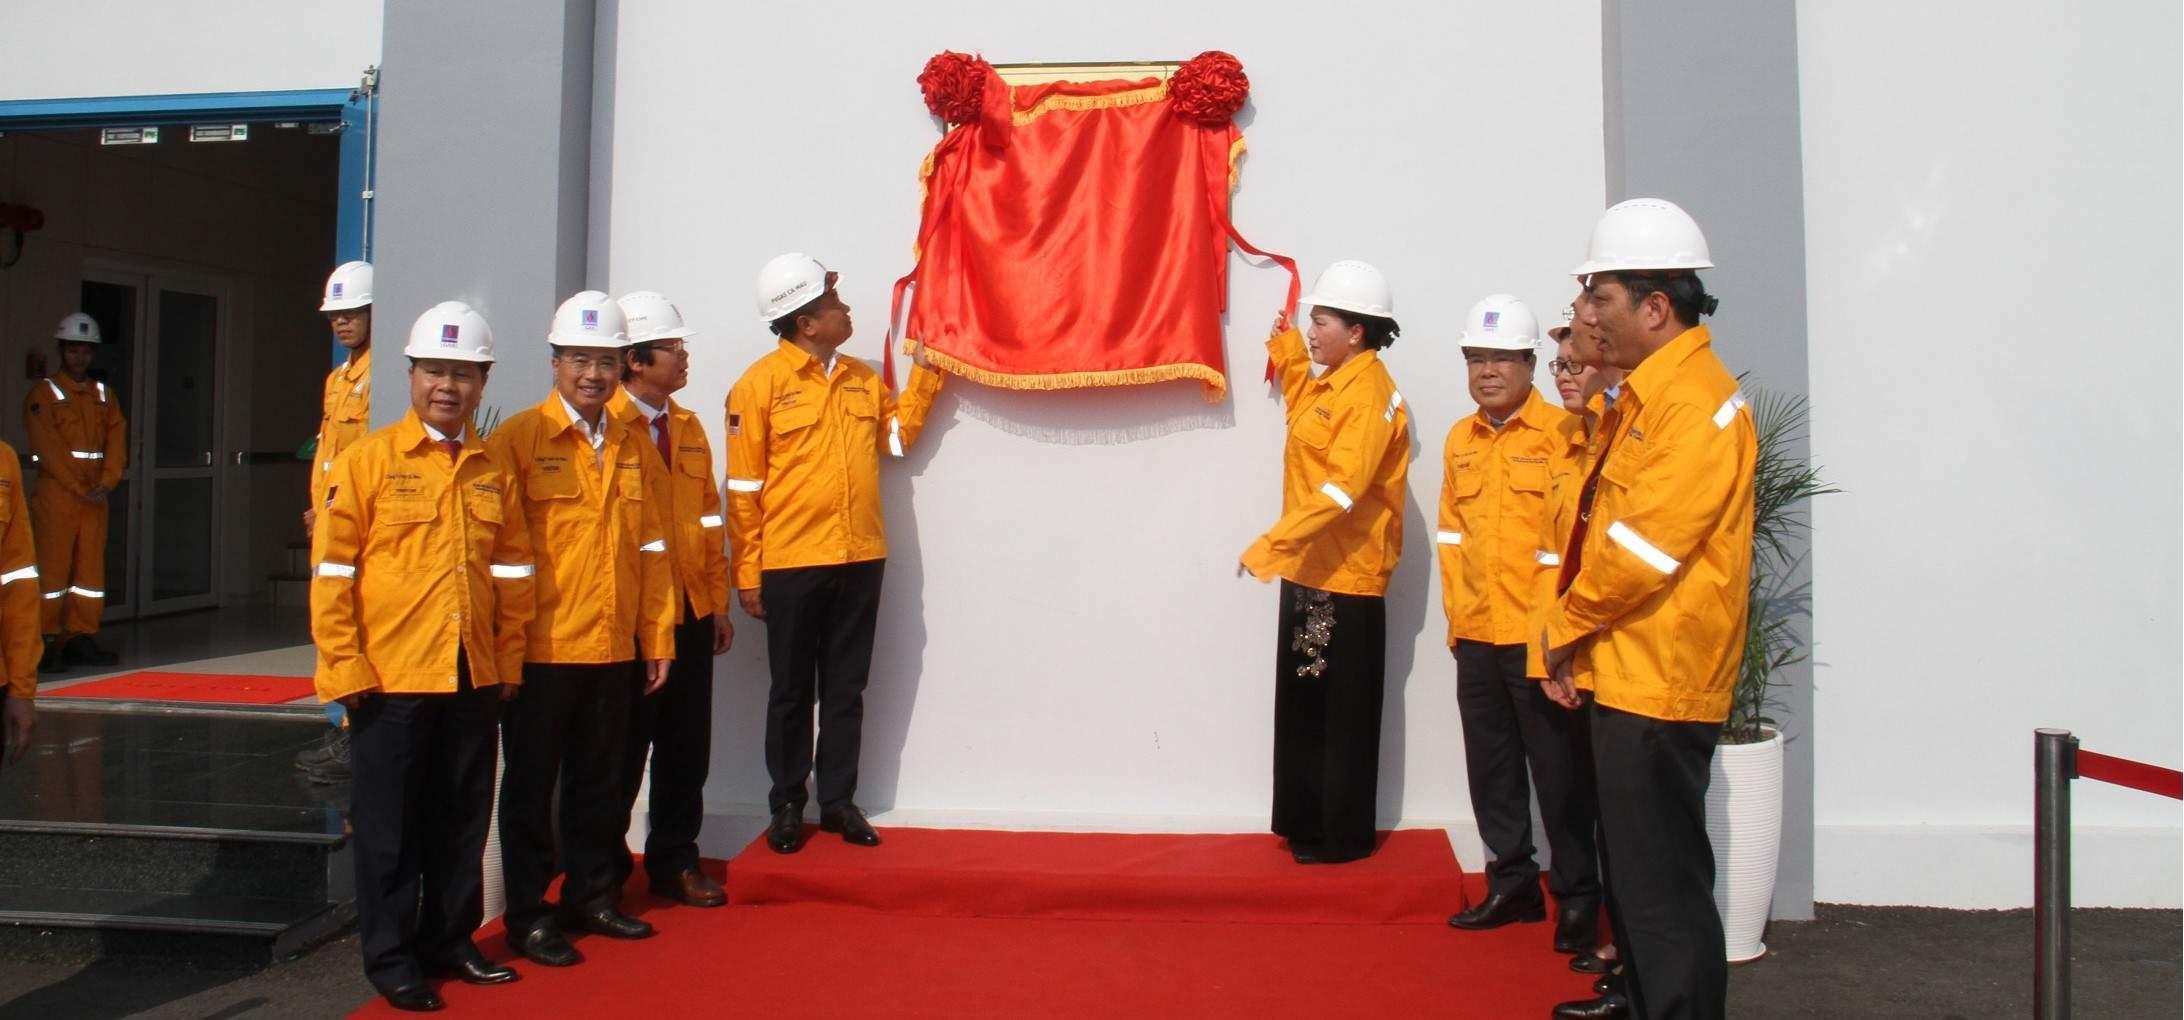 PetroVietnam Gas inaugurates $439m Ca Mau Gas Processing Plant in Vietnam